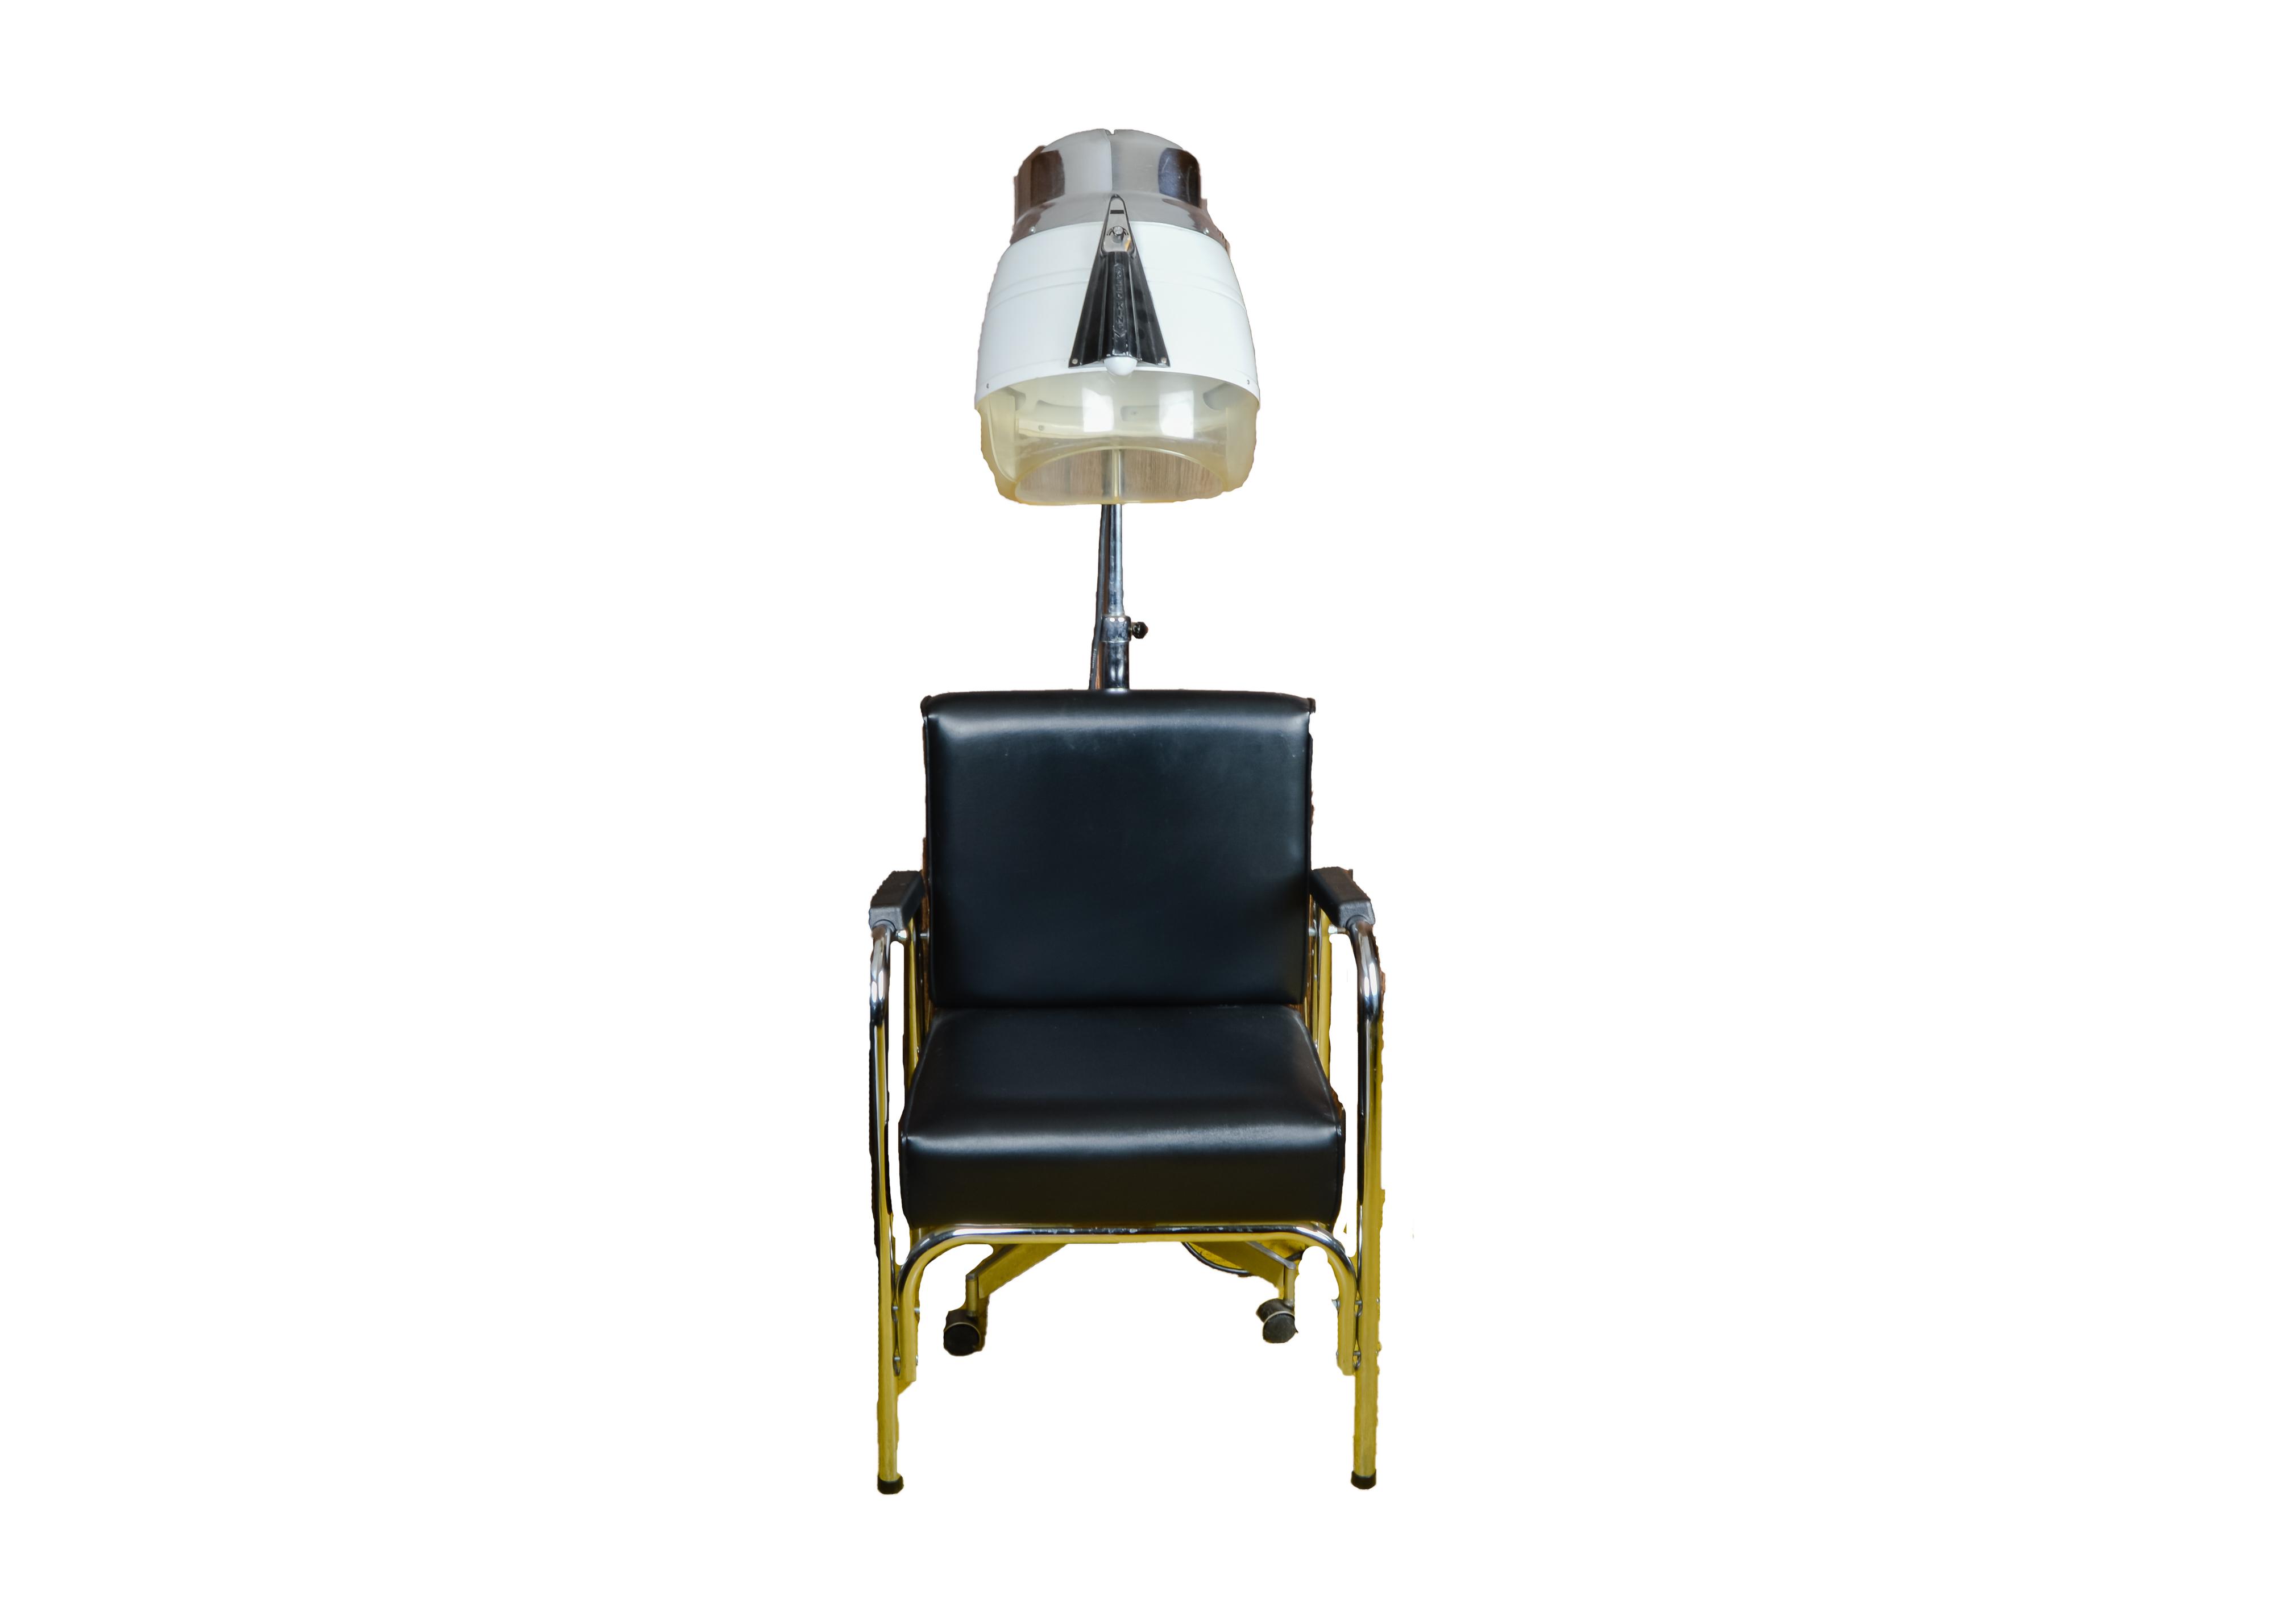 Speed King Salon Hair Heat Lamp and P.S. Pibbs Salon Chair : EBTH